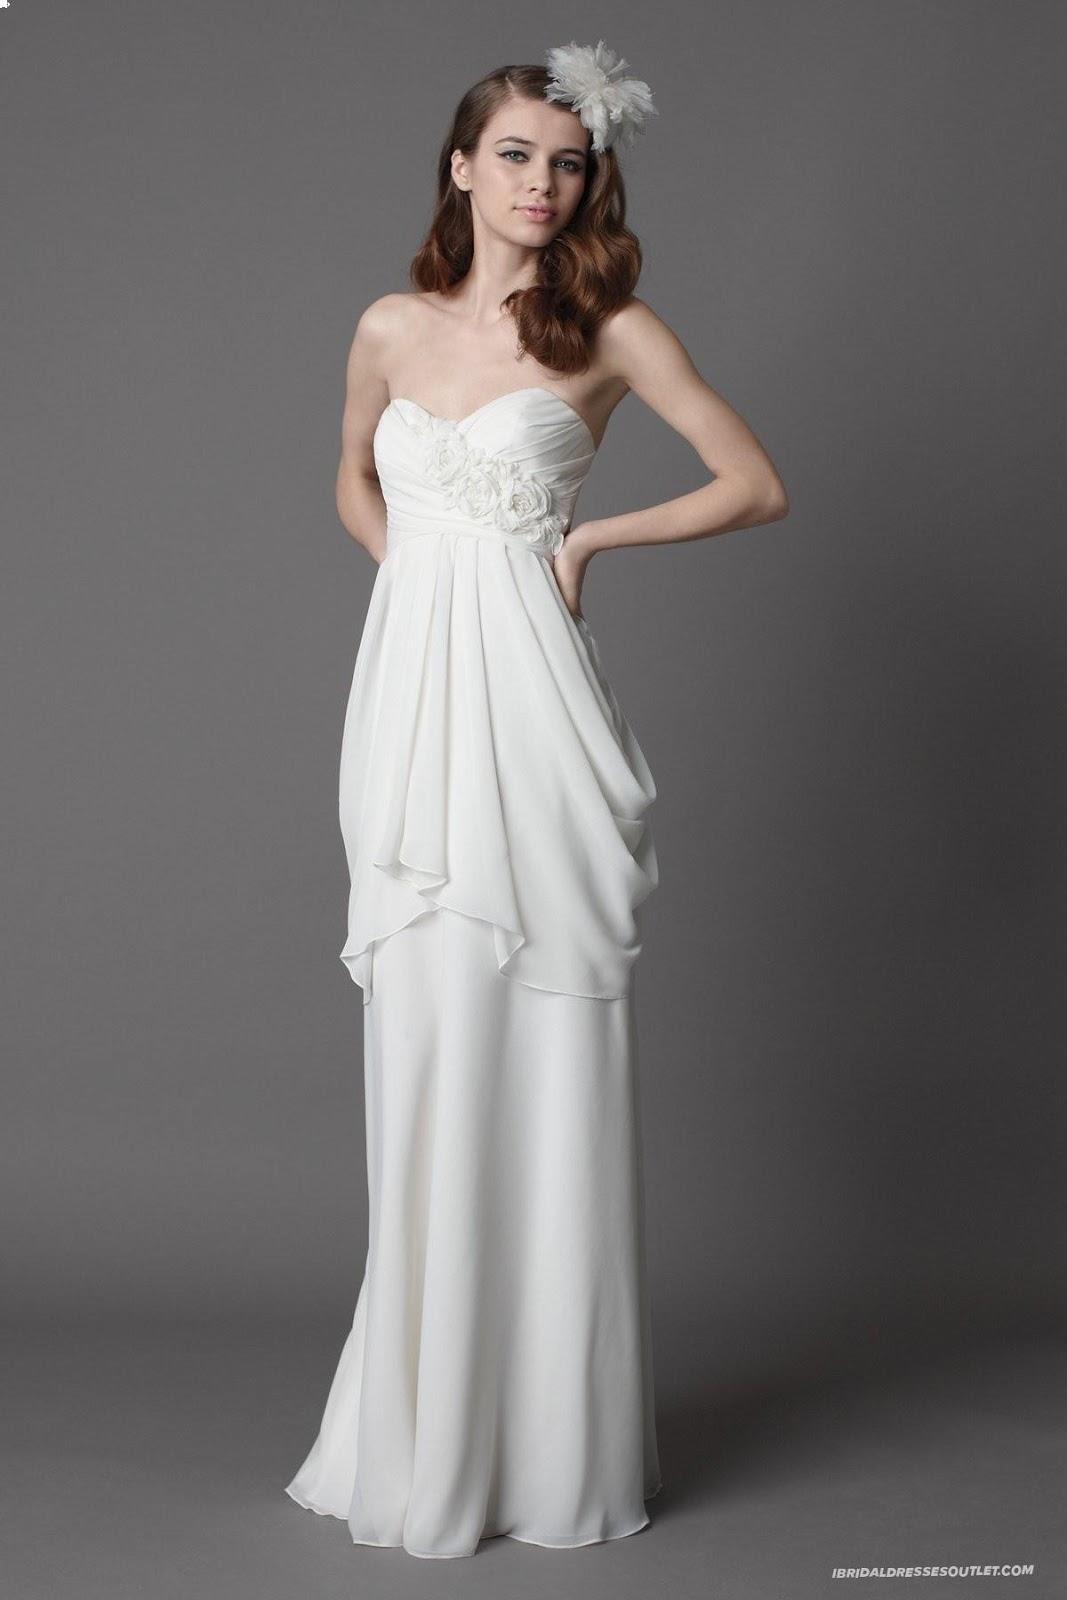 Draped+Casual+Wedding+Dress+for+Outdoor+Weddings - Informal Wedding Dresses